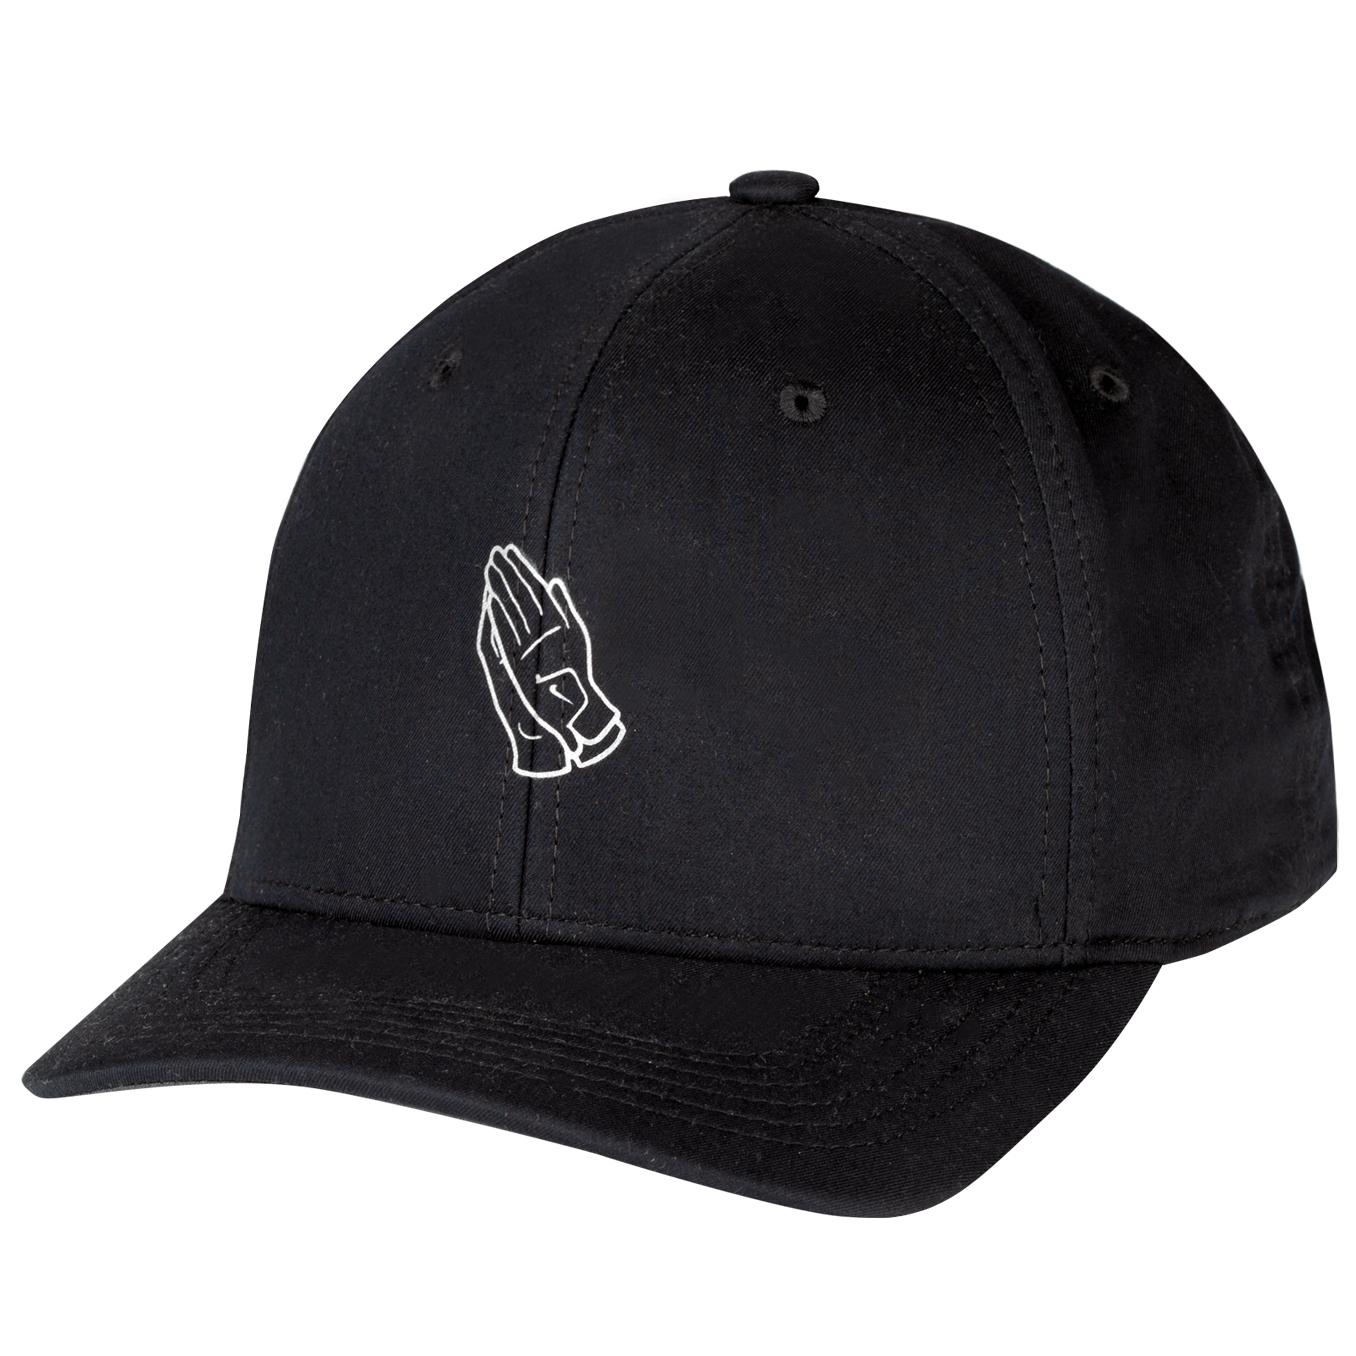 937c4e00c x Nike Sport Cap Black - 2018   Clothing   Malbon Golf   All Square Golf